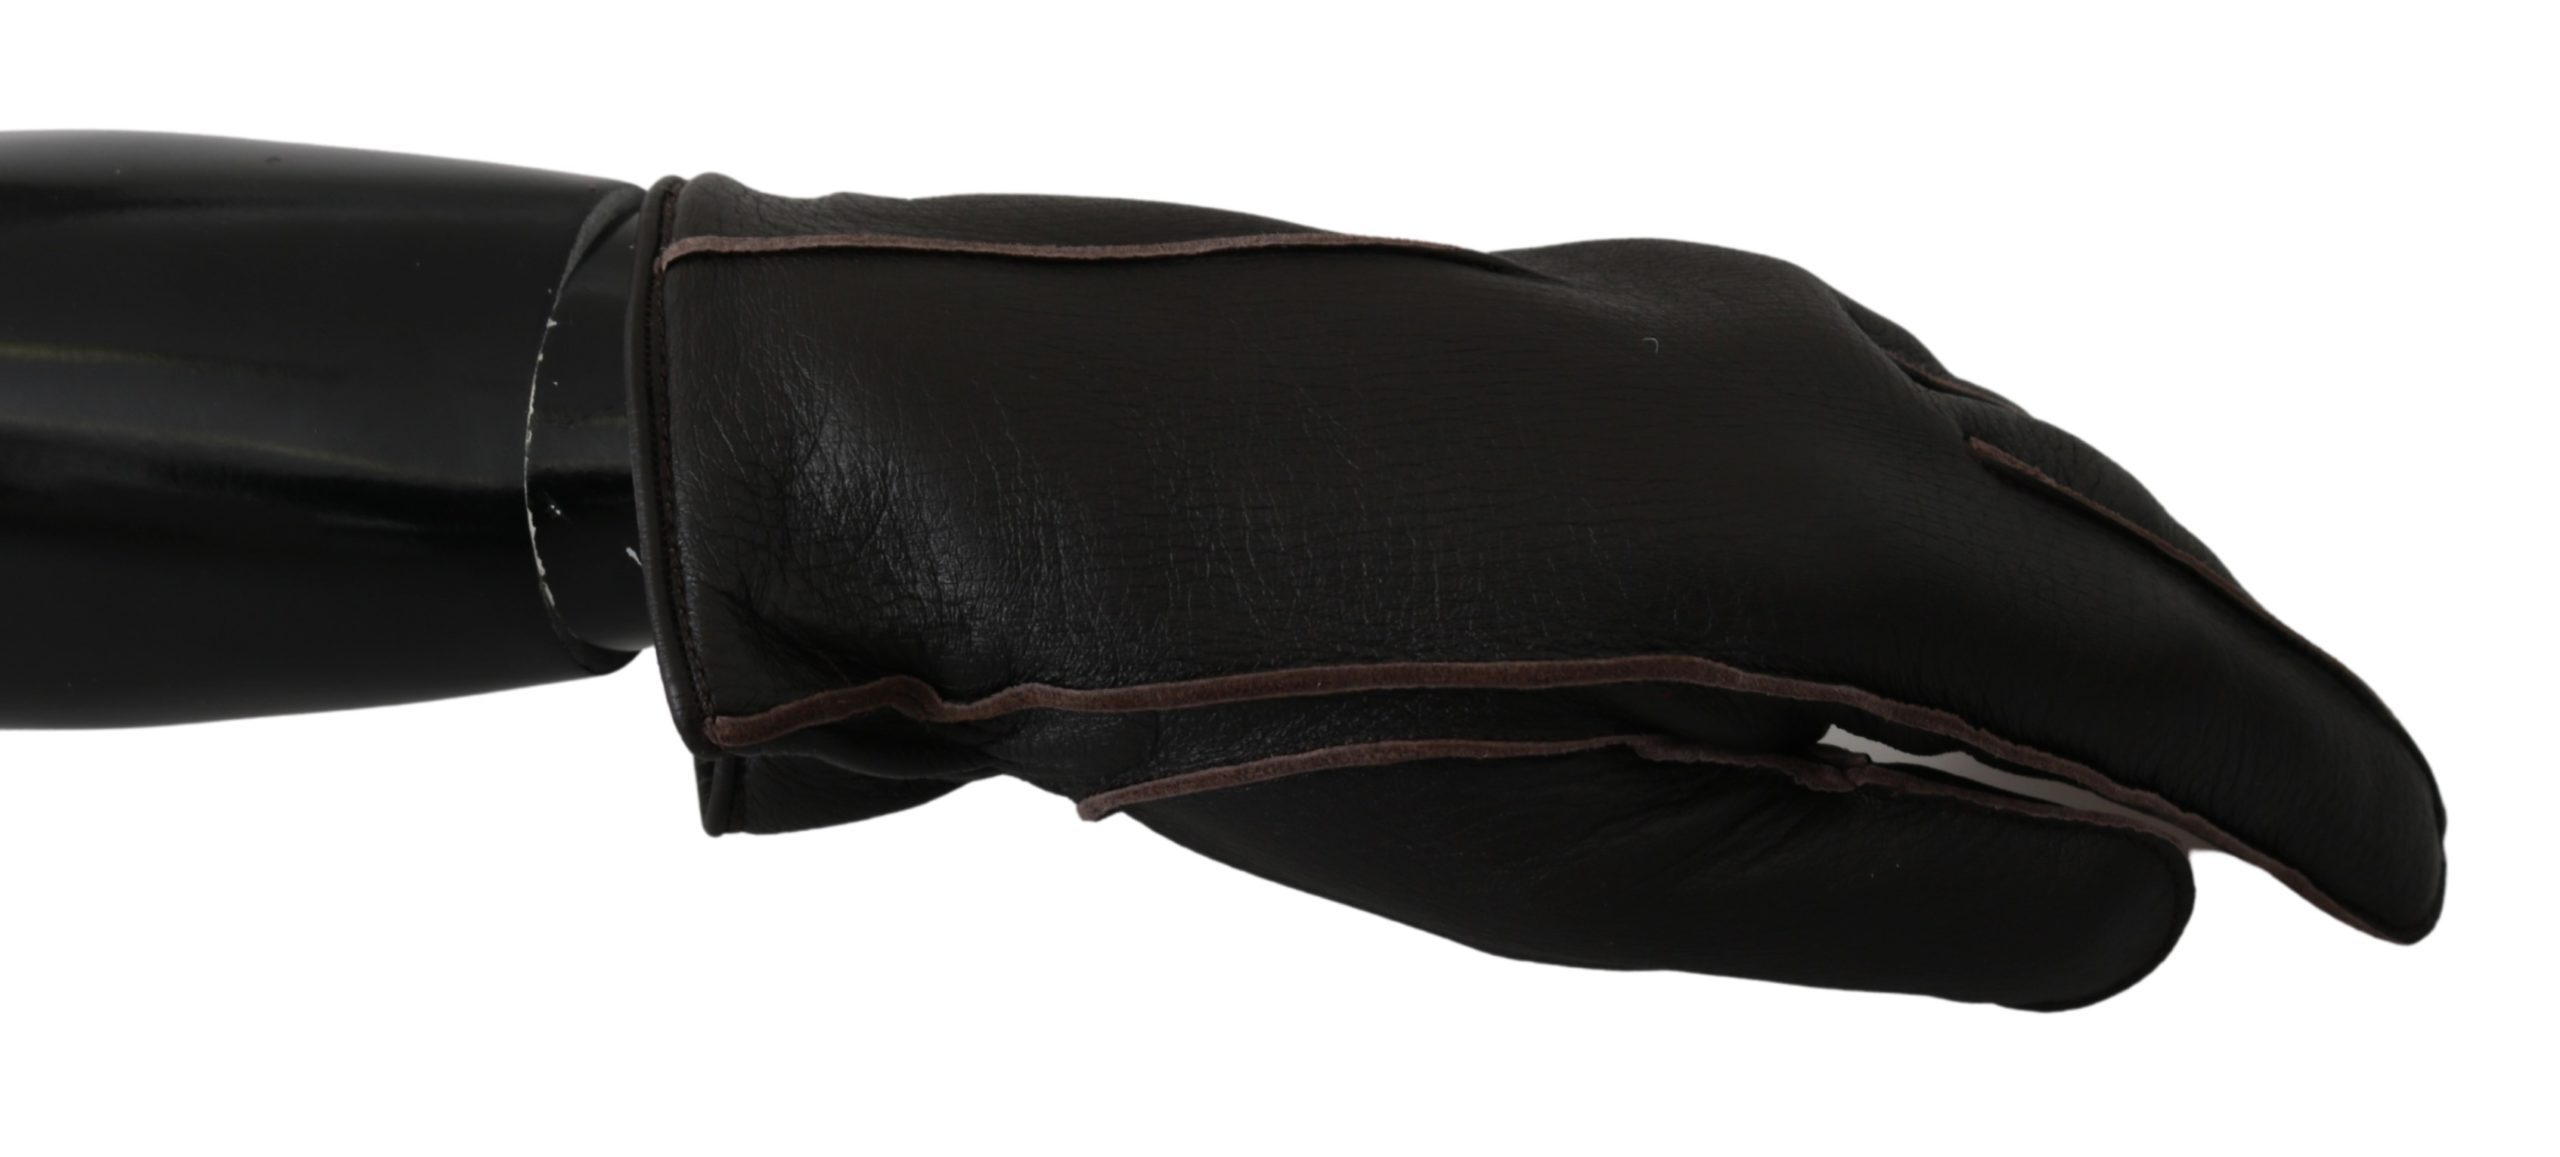 Dolce & Gabbana Women's Leather Deer Skin Biker Mitten Gloves Black LB1005 - 10|XL